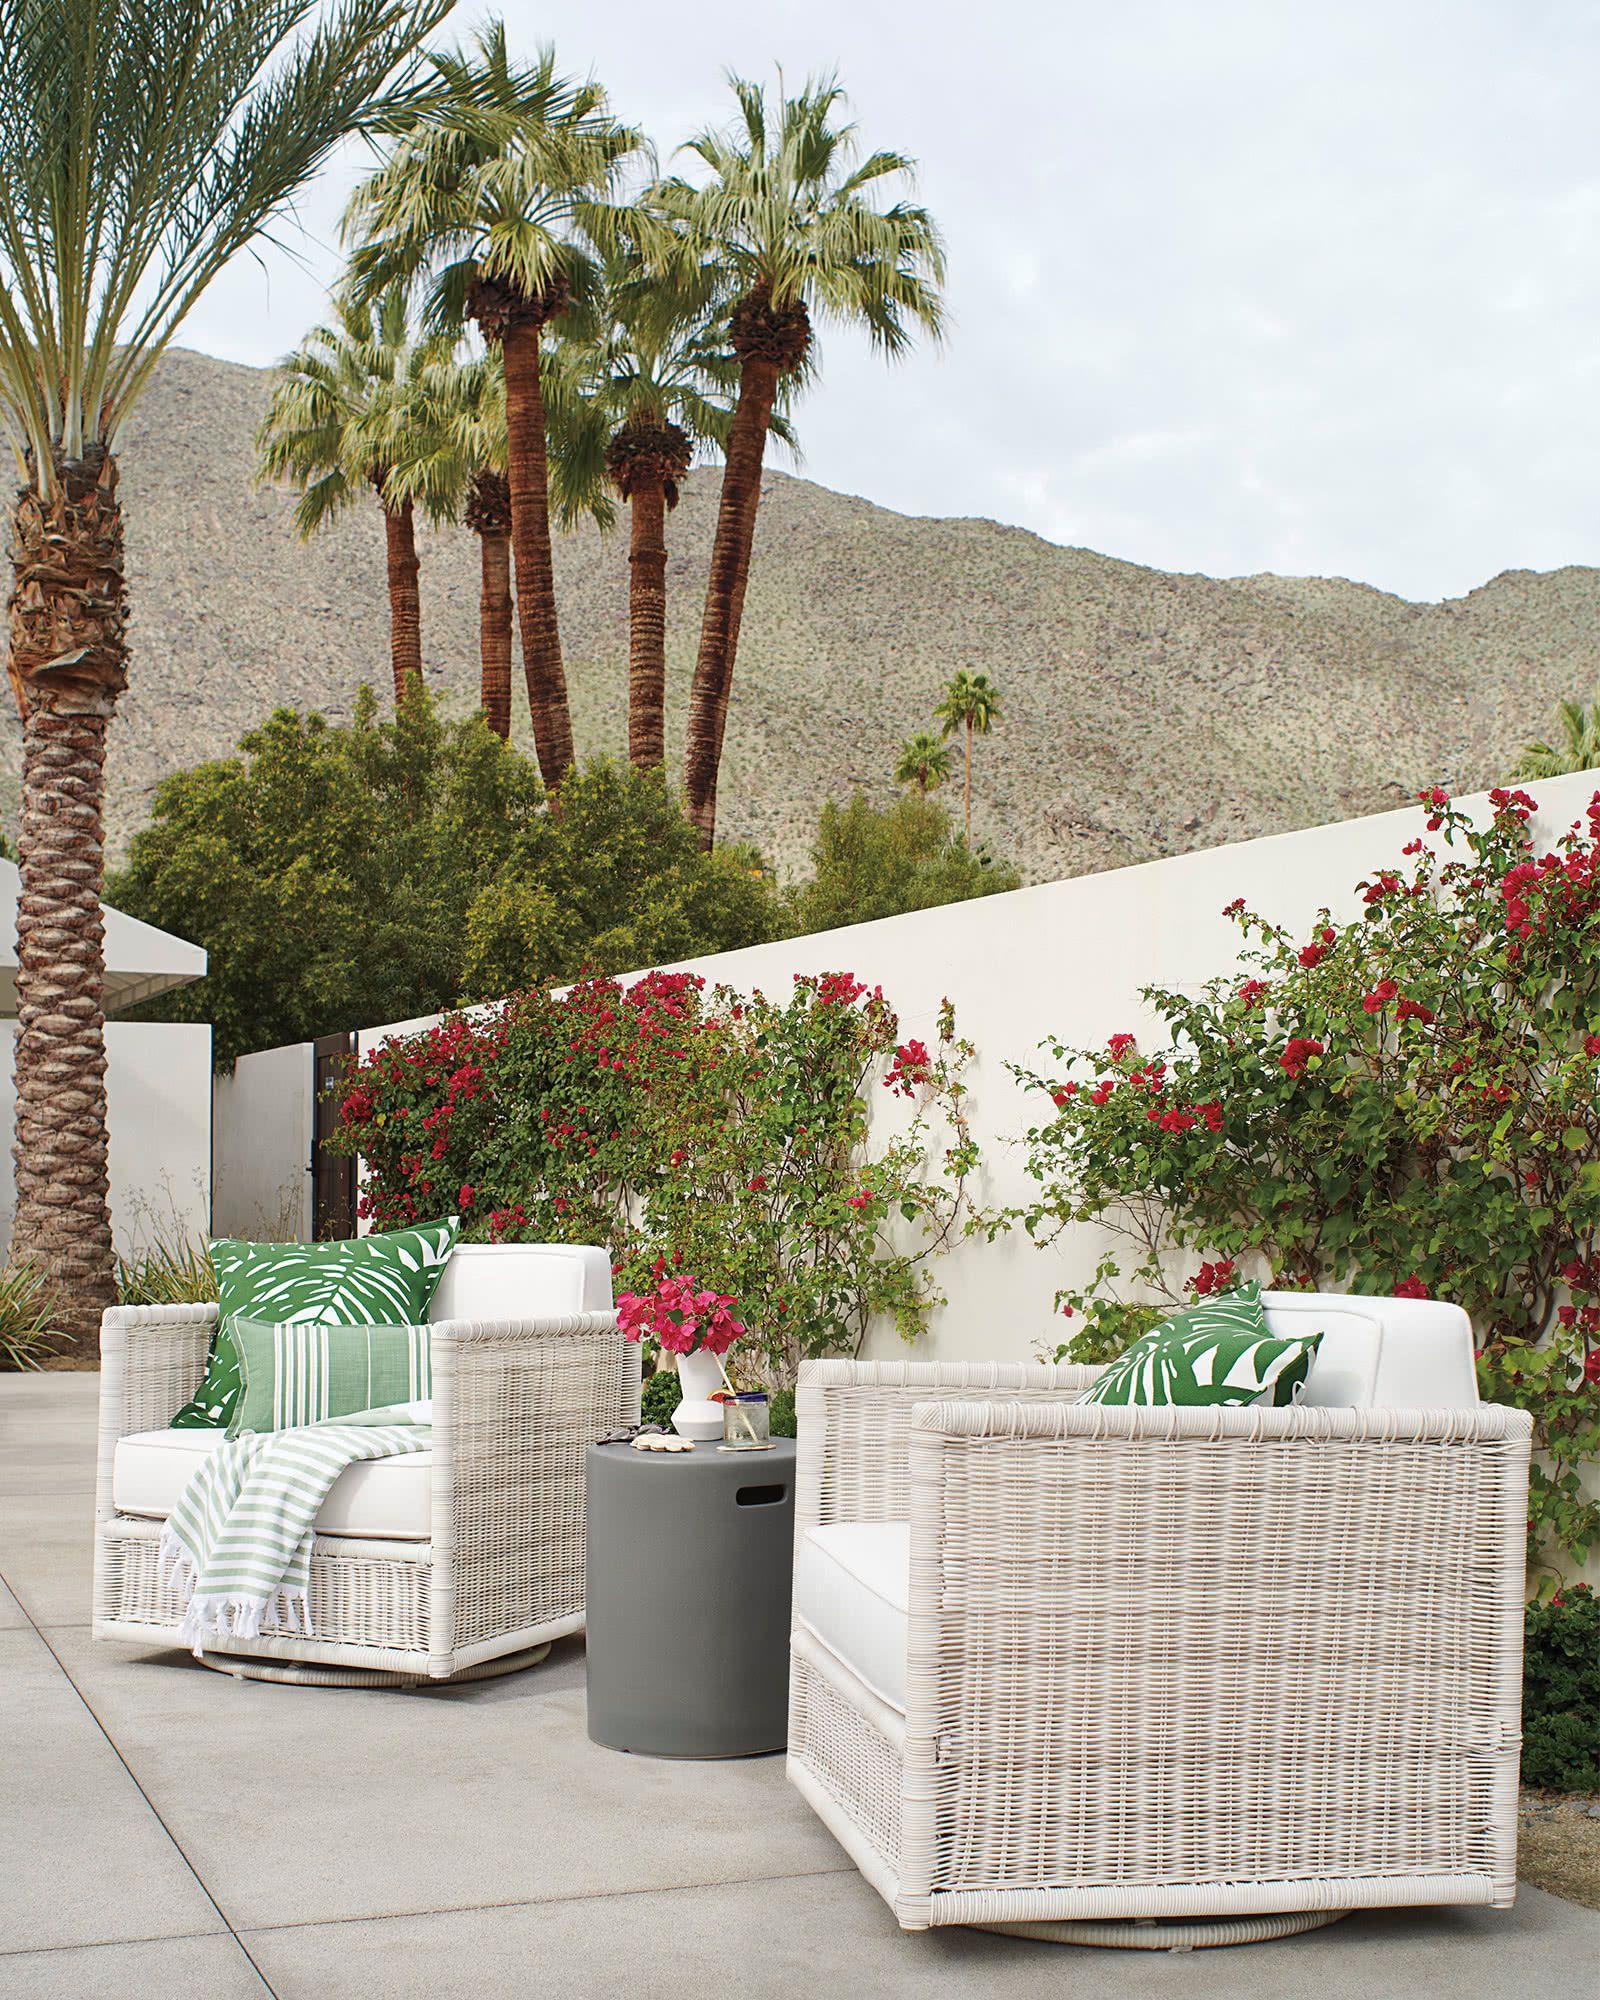 Palm Pillow Cover Con Imagenes Terraza Jardin Terrazas Jardines